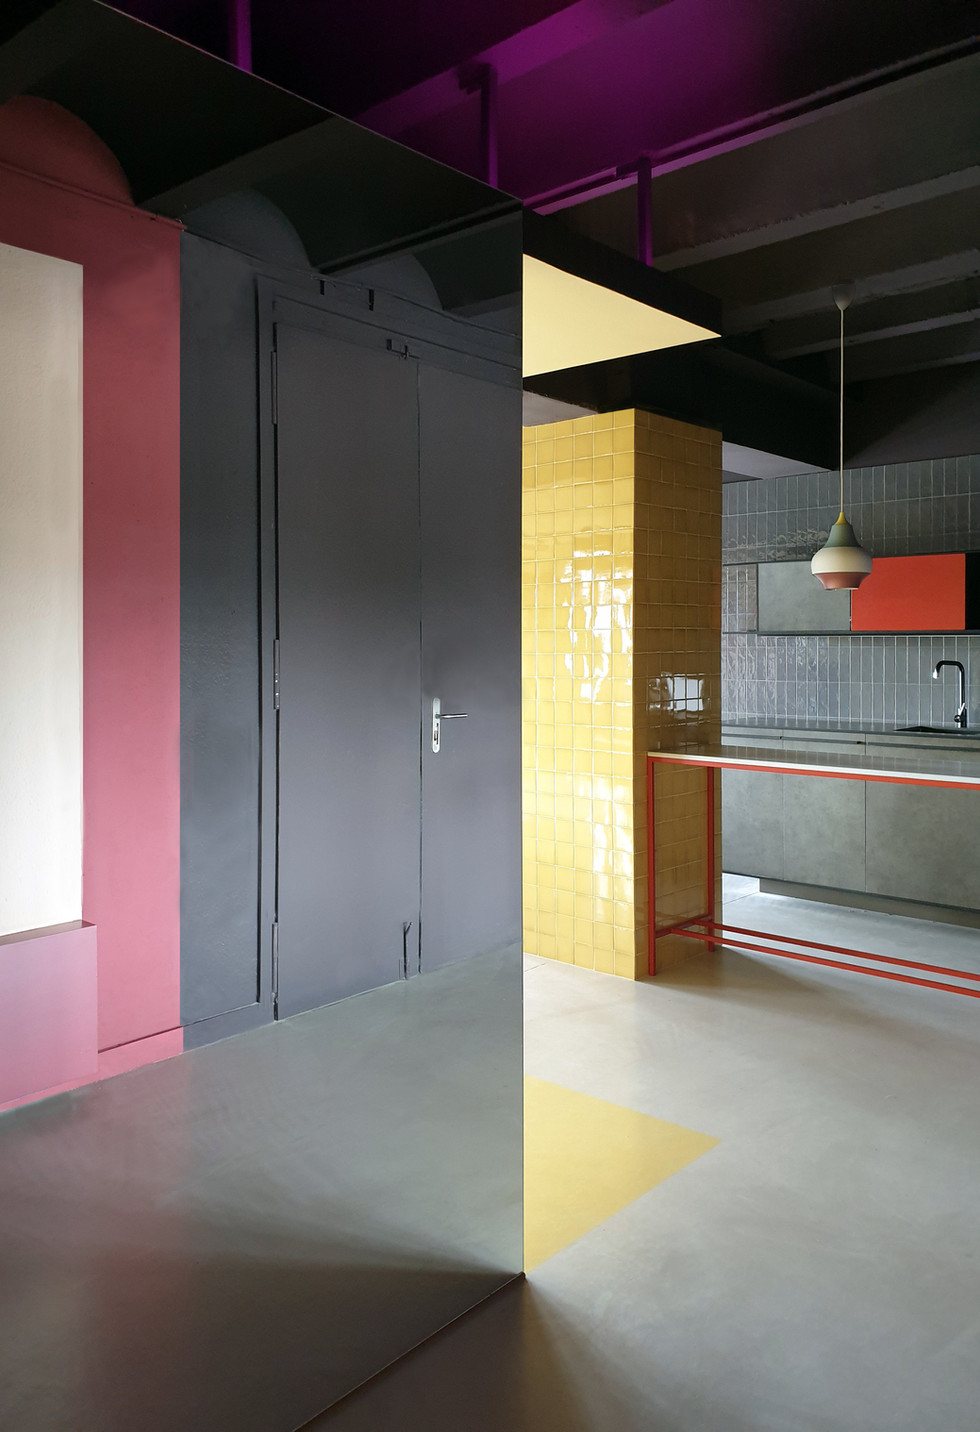 MHNL Unlimited Studio 02- Elvira Guardia